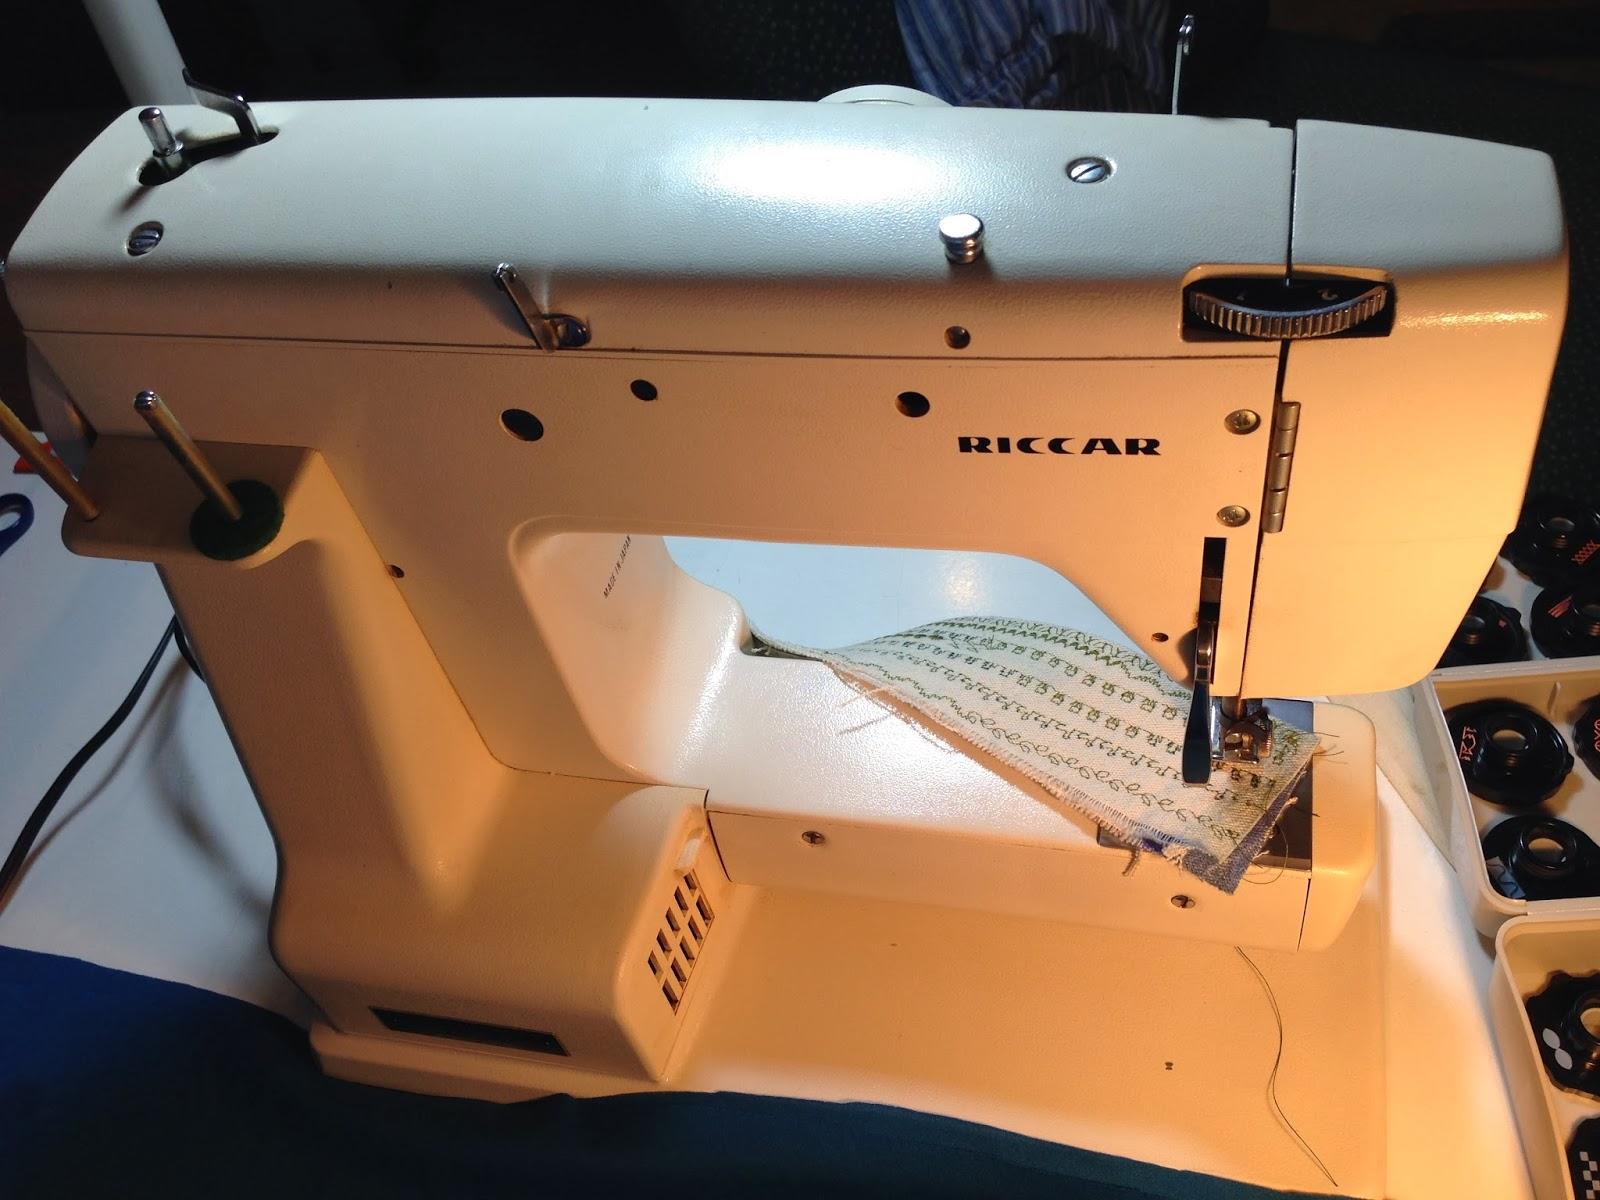 riccar 888 sewing machine